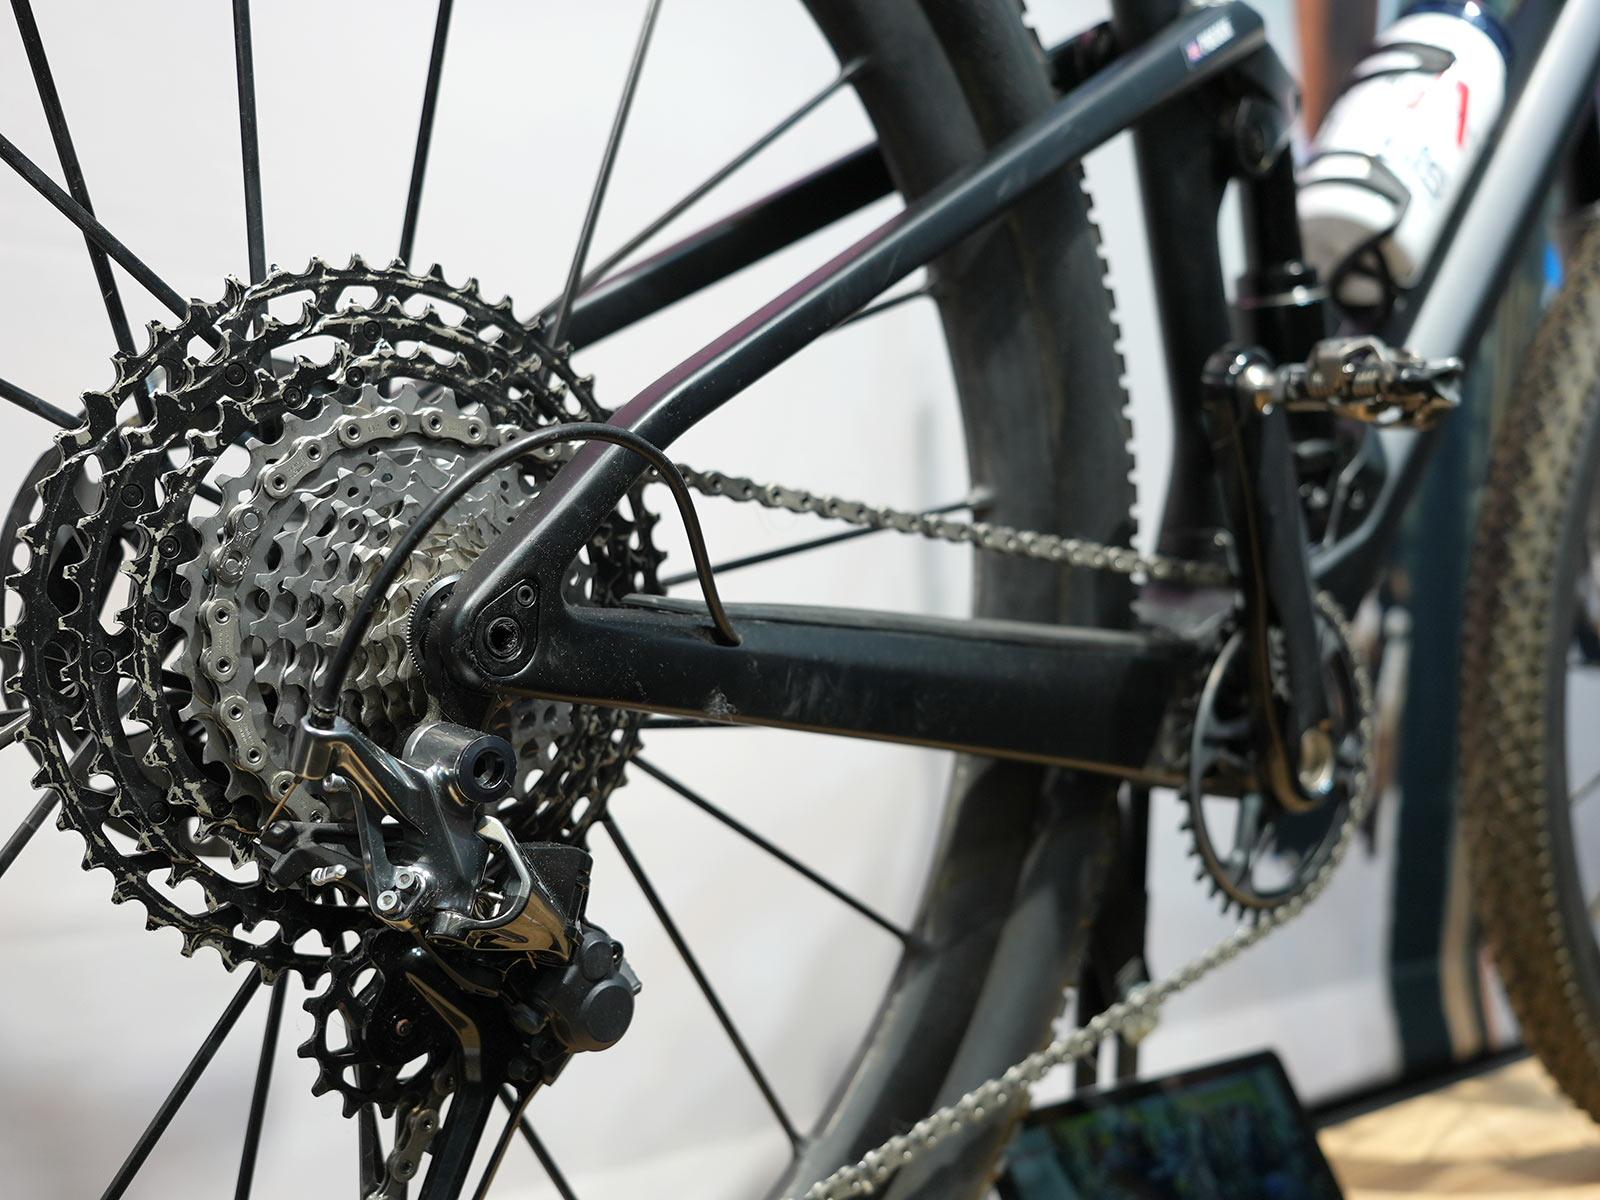 tom pidcock's olympic gold medal winning xc mountain bike with XTR drivetrain